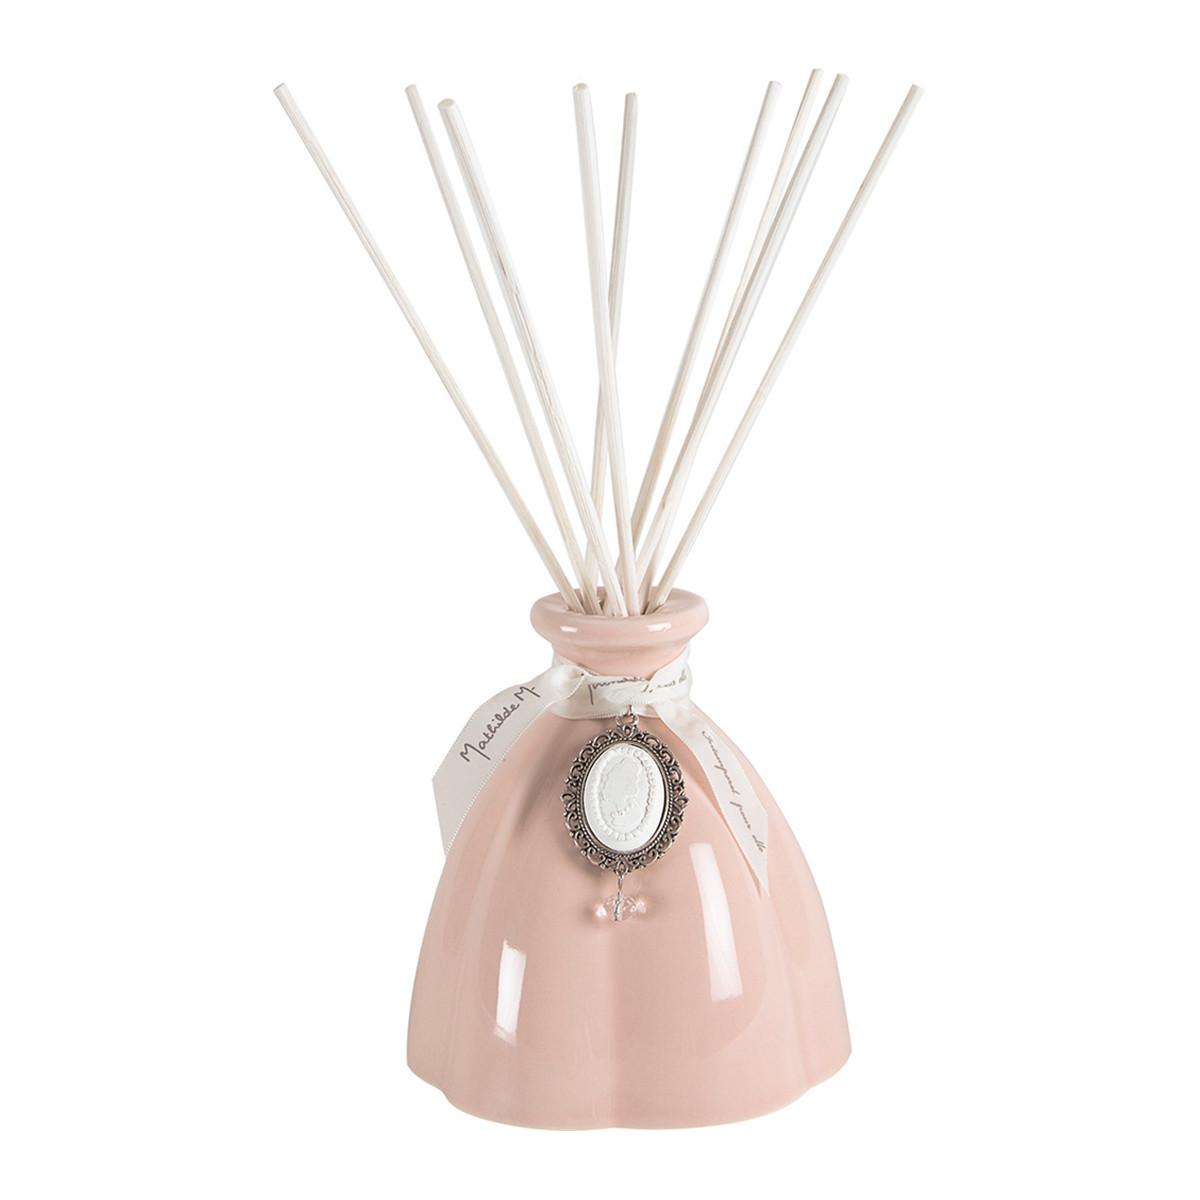 Аромадиффузор аромат для дома Божественная Маркиза 200мл Mathilde M MPDPCAMA0015